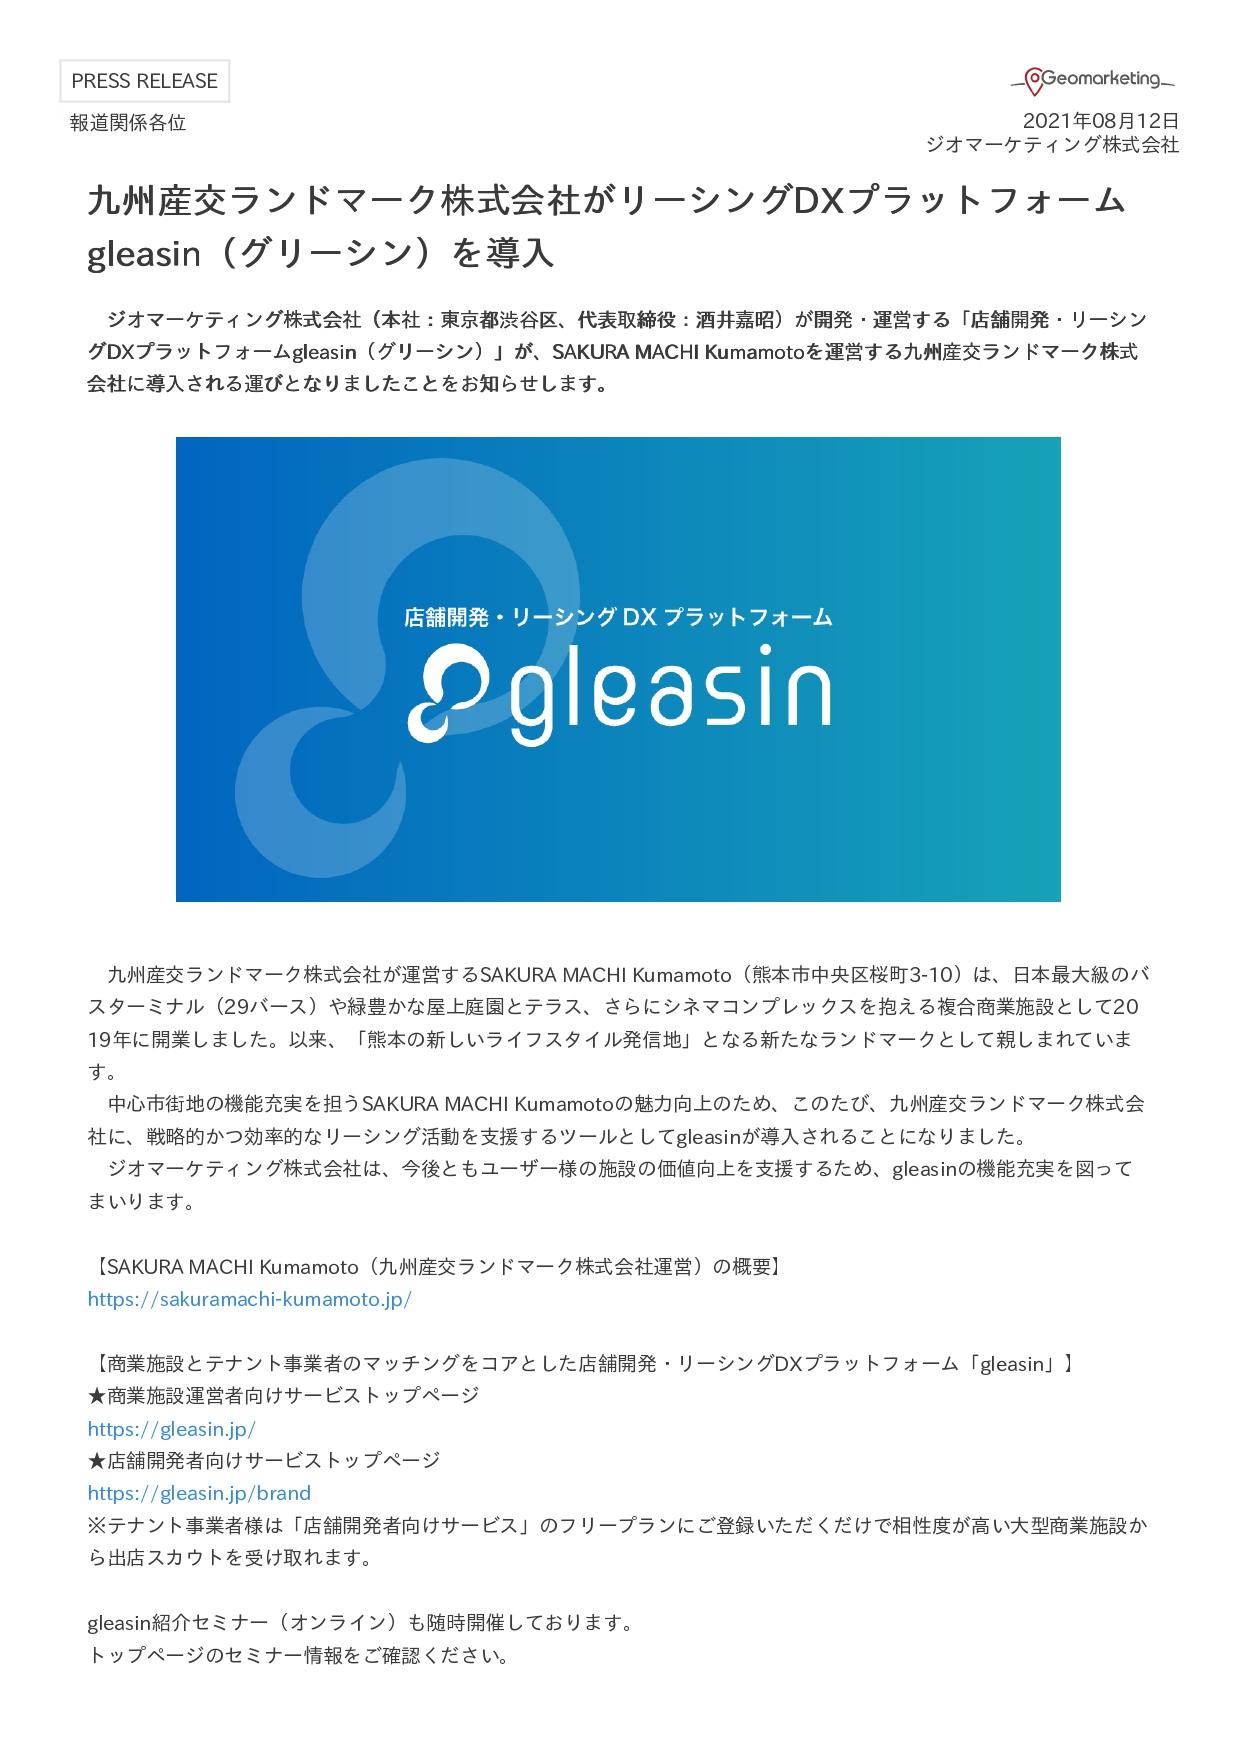 20210812_PRTimesプレスリリース_九州産交ランドマーク株式会社-1